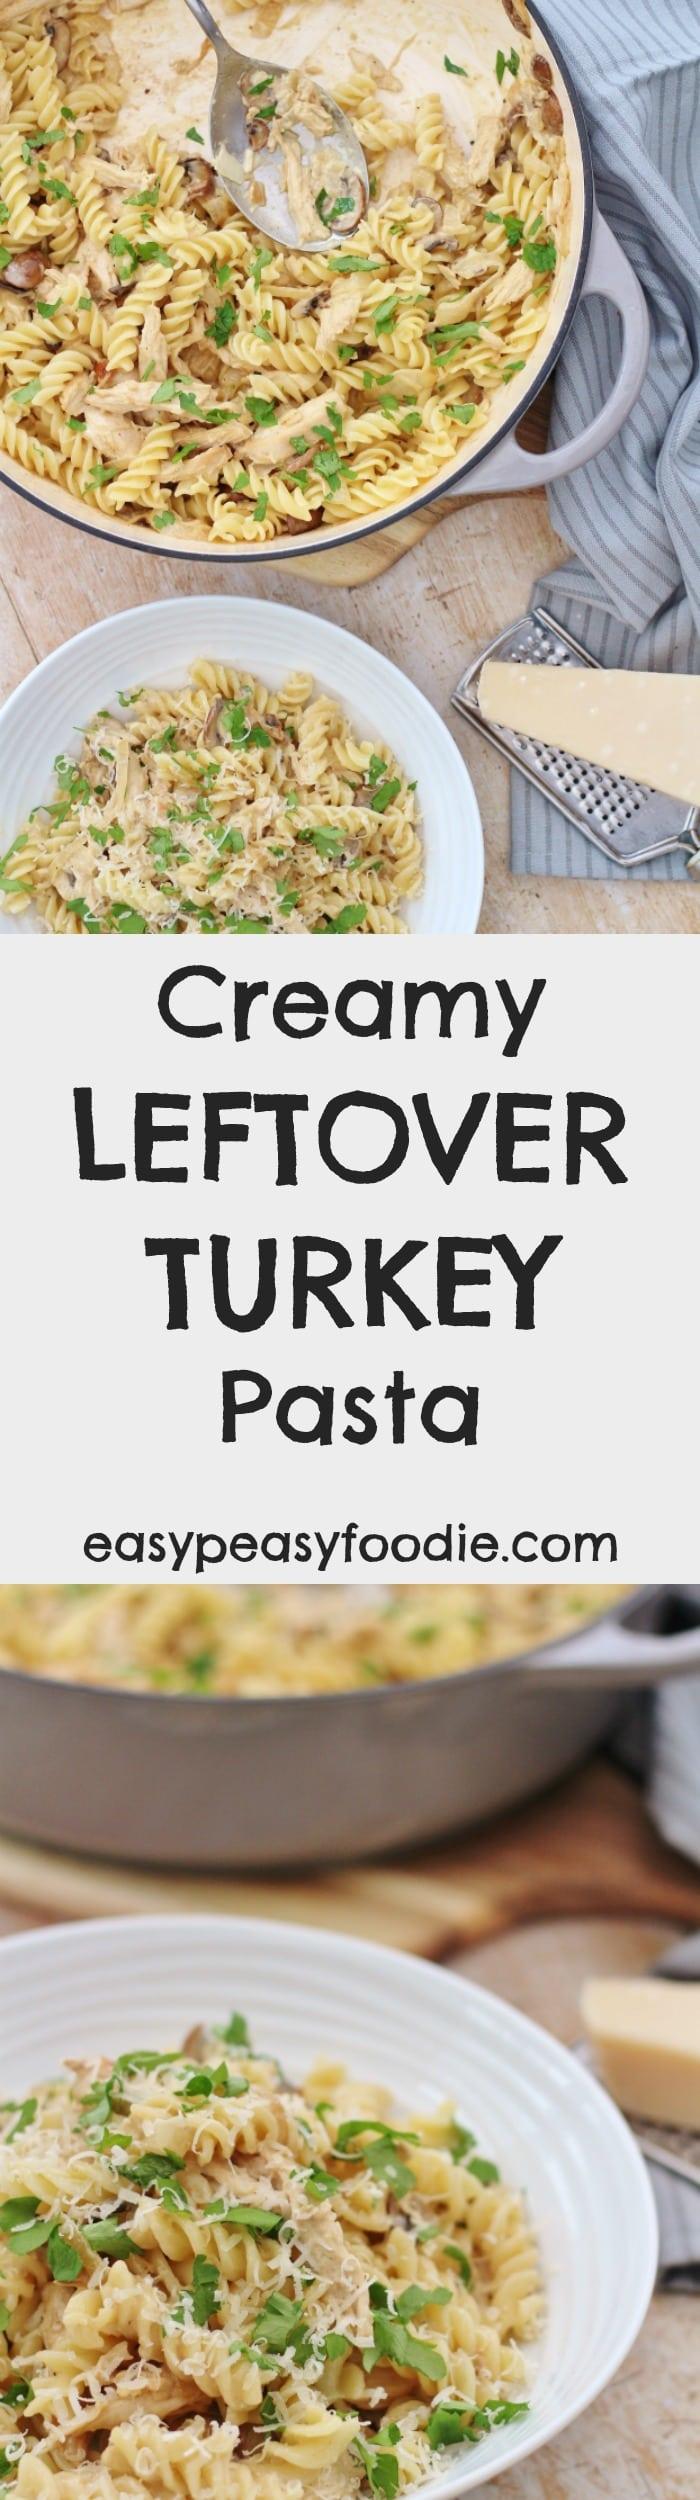 Creamy Leftover Turkey Pasta - pinnable image for Pinterest